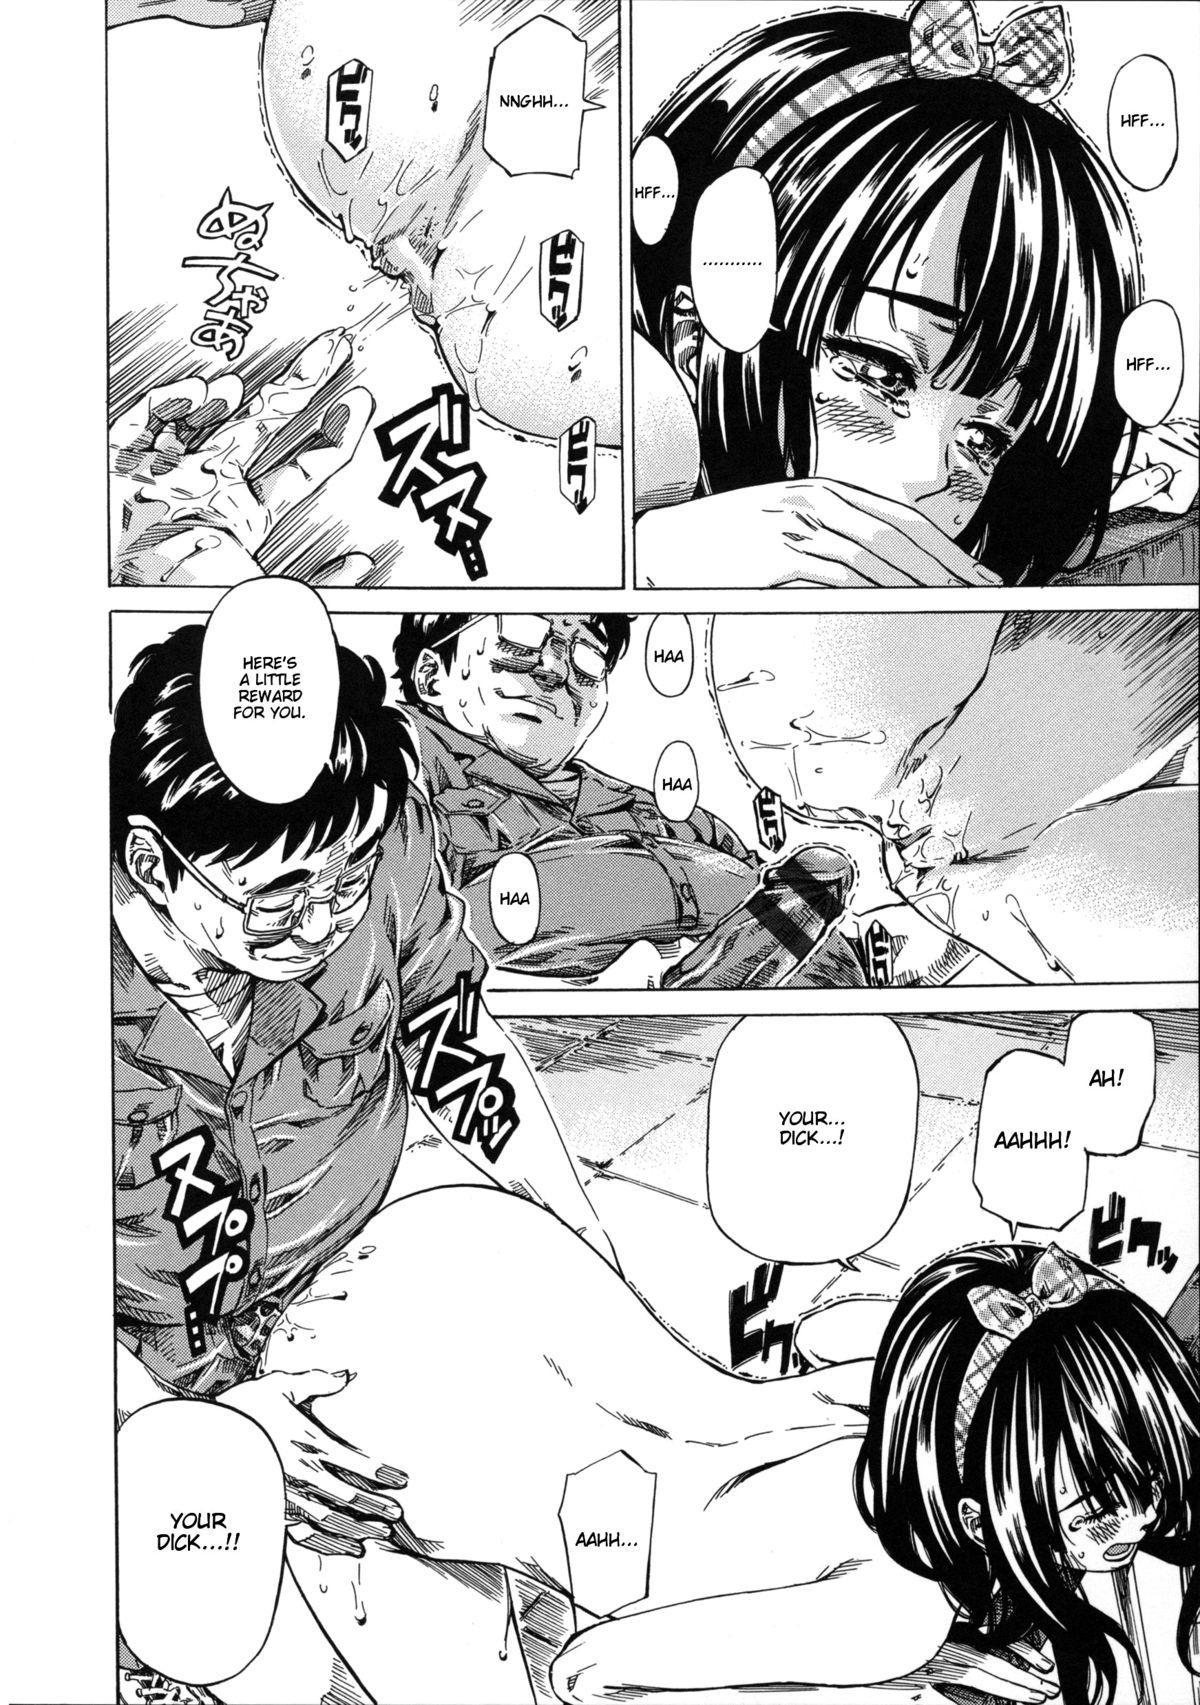 Kashiwazaki Miki wa Ironna Basho de Zenra Sanpo Shitemita   Miki Kashiwazaki Goes Naked in All Sorts of Places Ch. 1-4 40